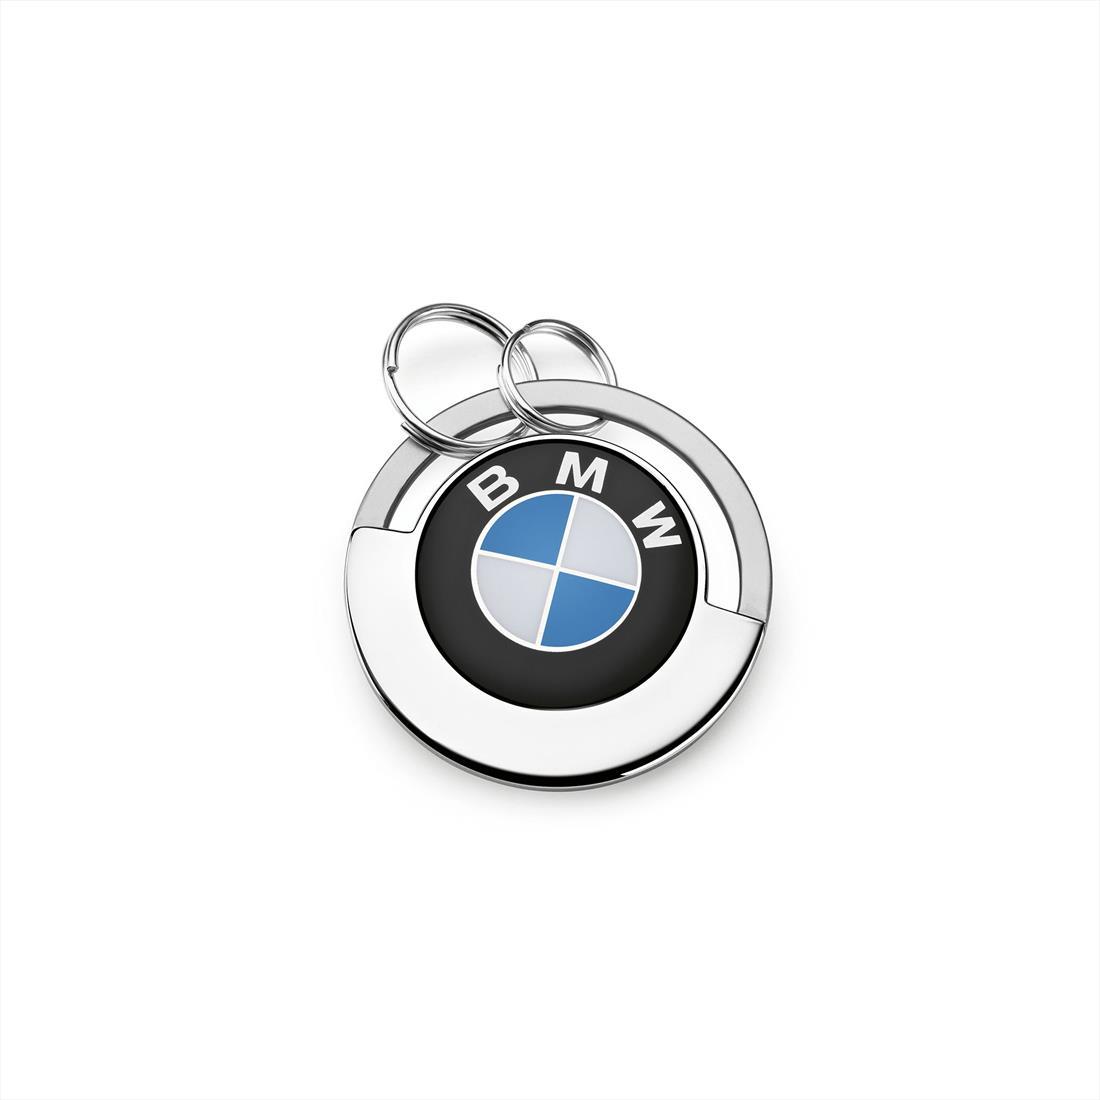 BMW DISC KEY RING